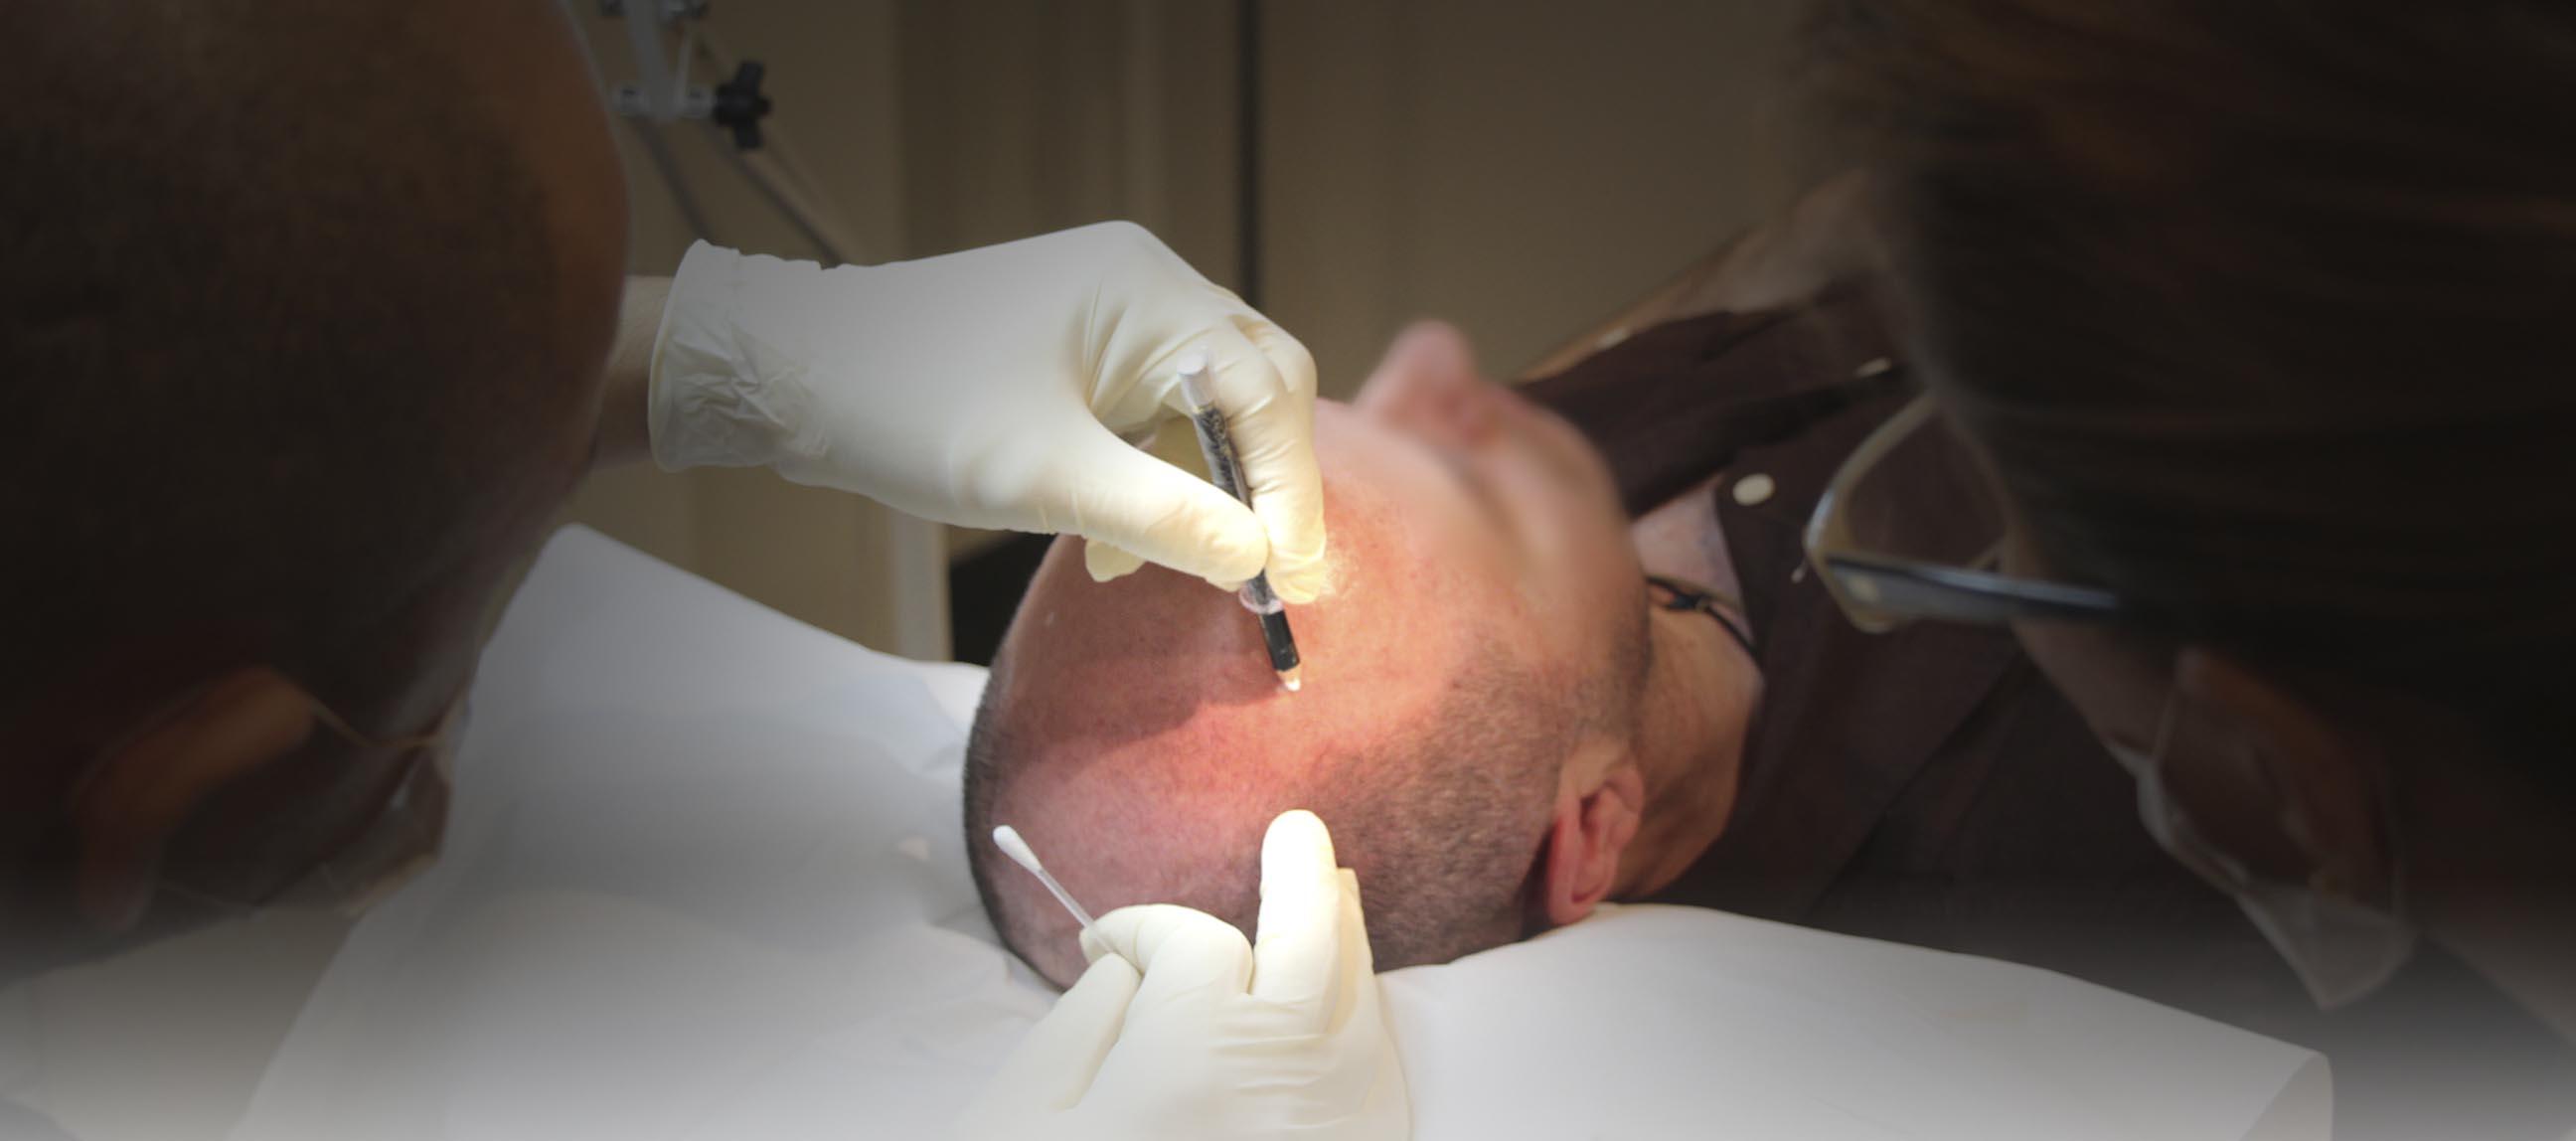 redeem eyebrow tattoo scalp micropigmentation tattoo